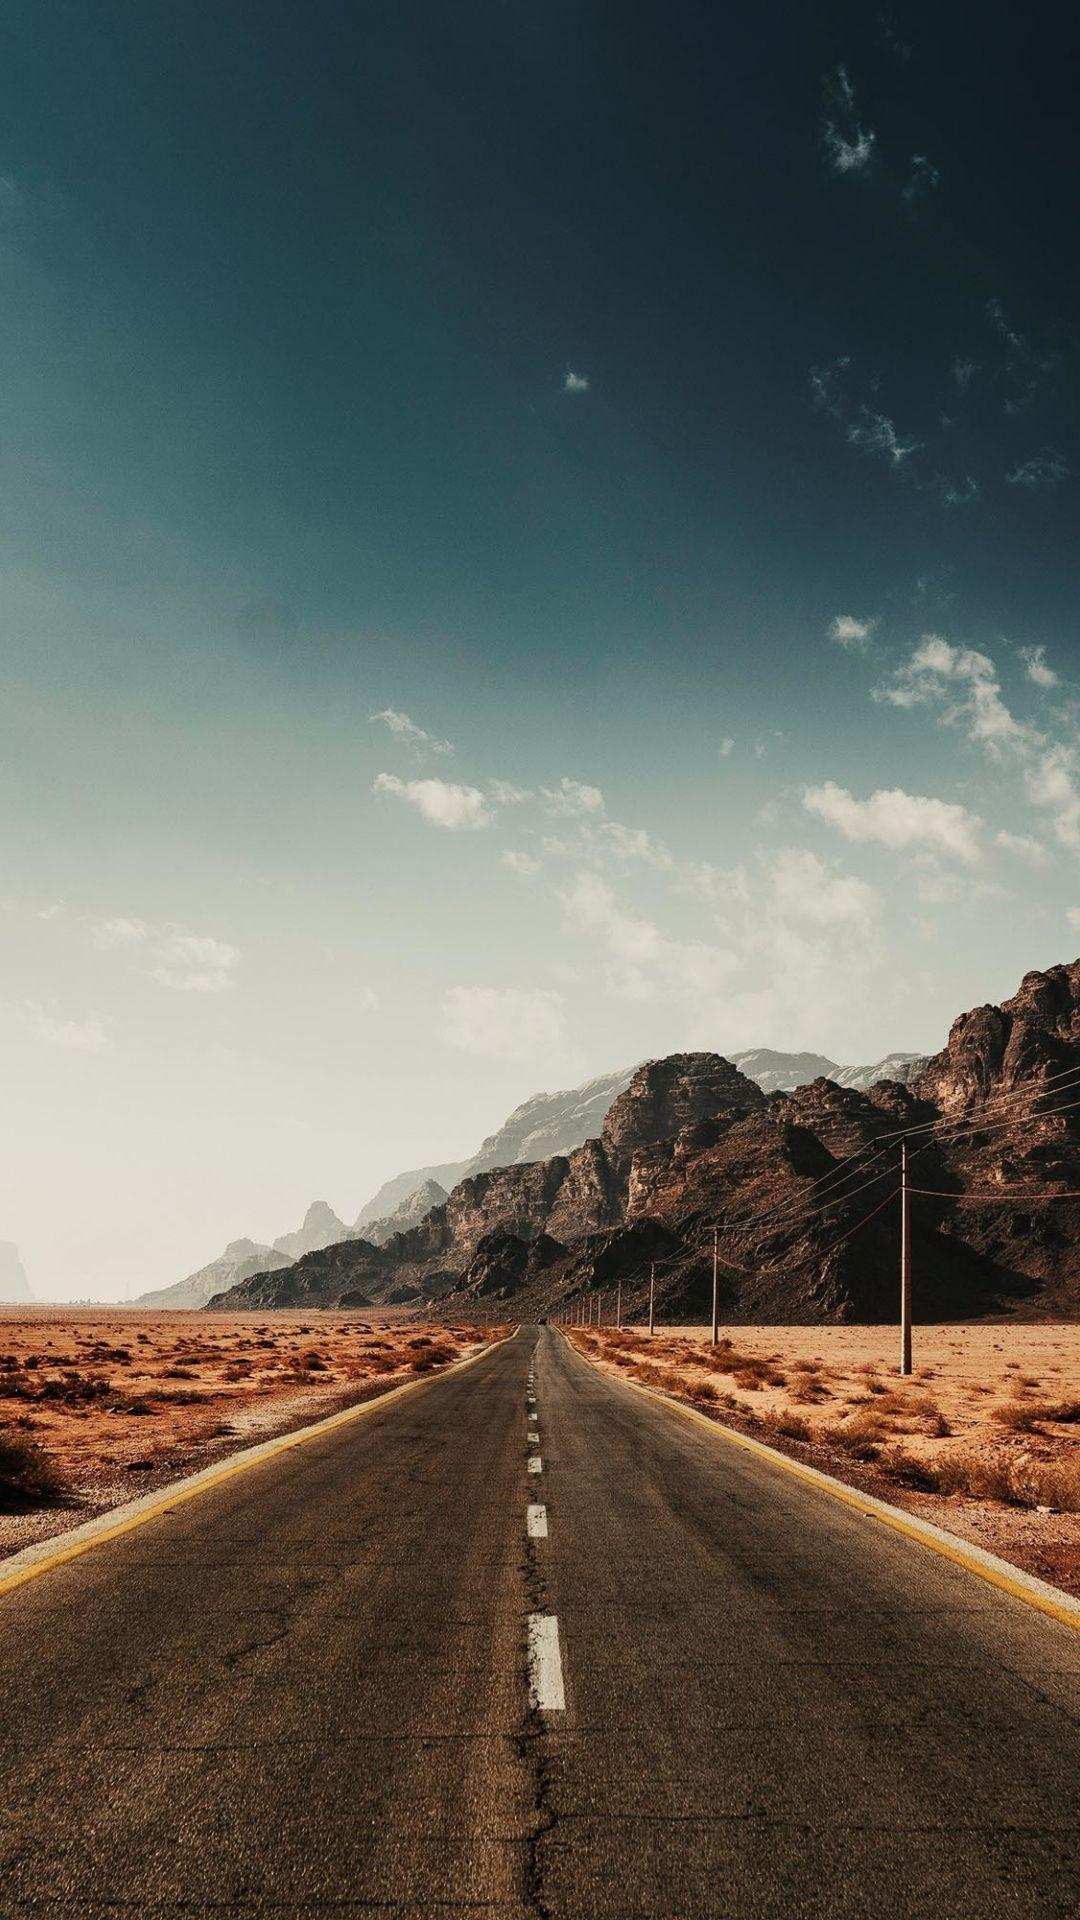 Landscape, highway, lone road, sky, 1080x1920 wallpaper